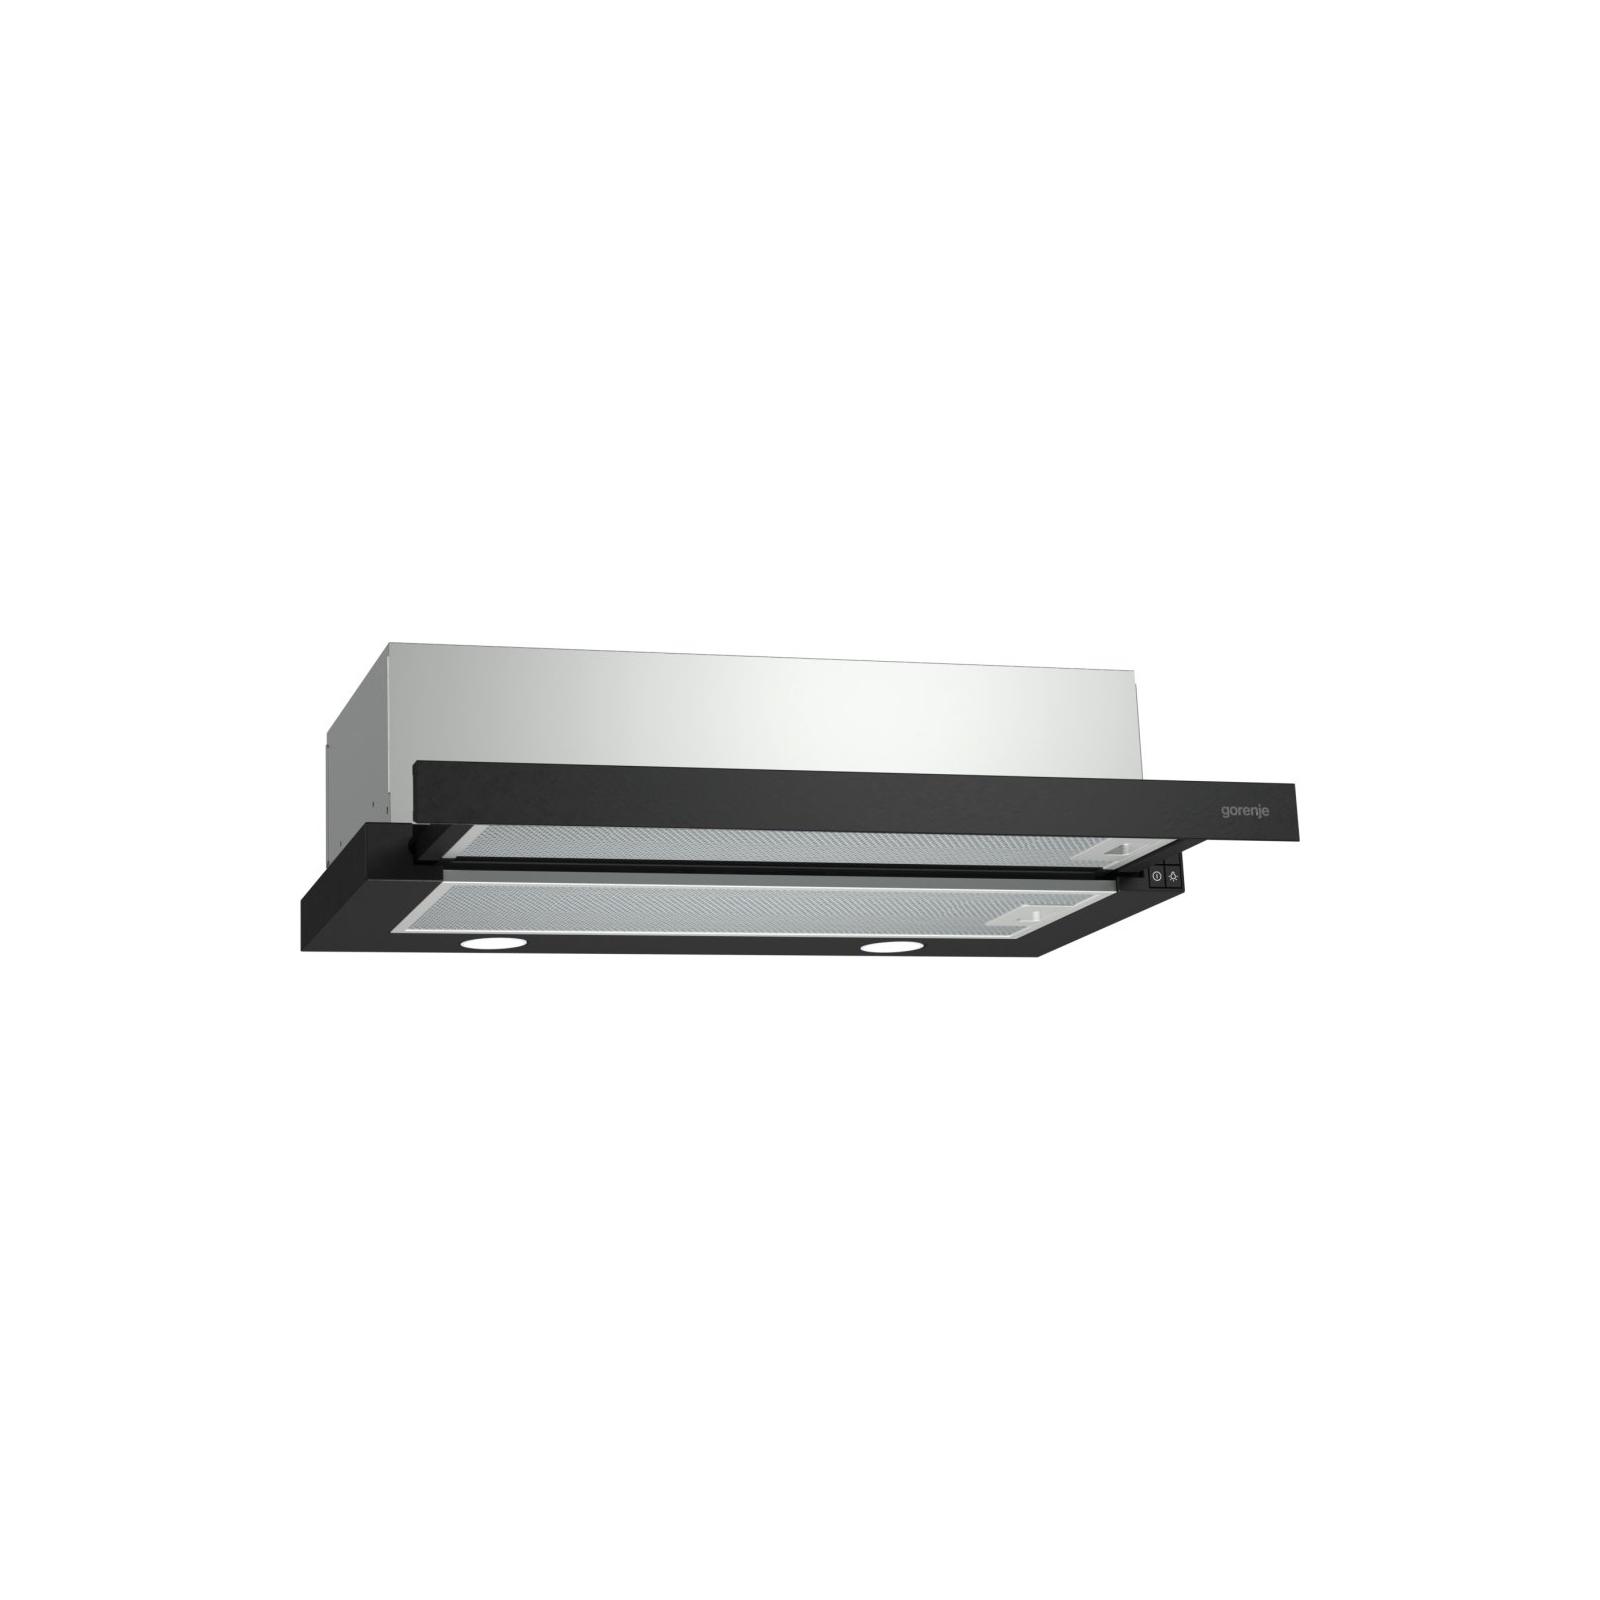 Вытяжка кухонная Gorenje BHP 623 E11X